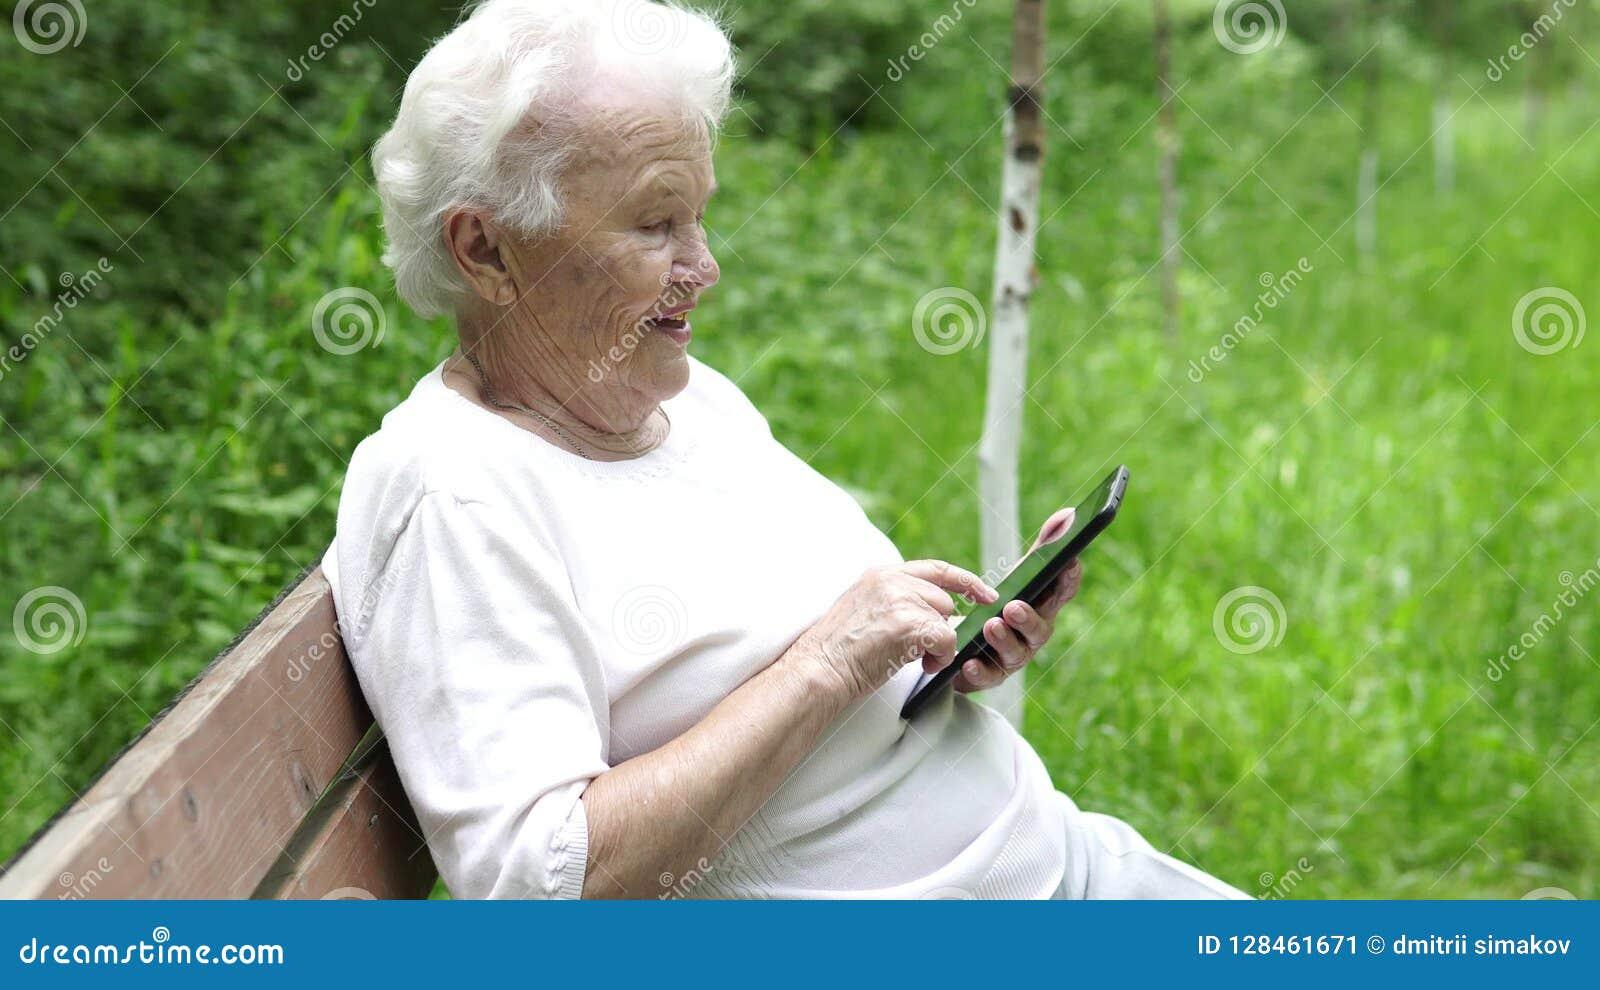 Granny thumbs mobile